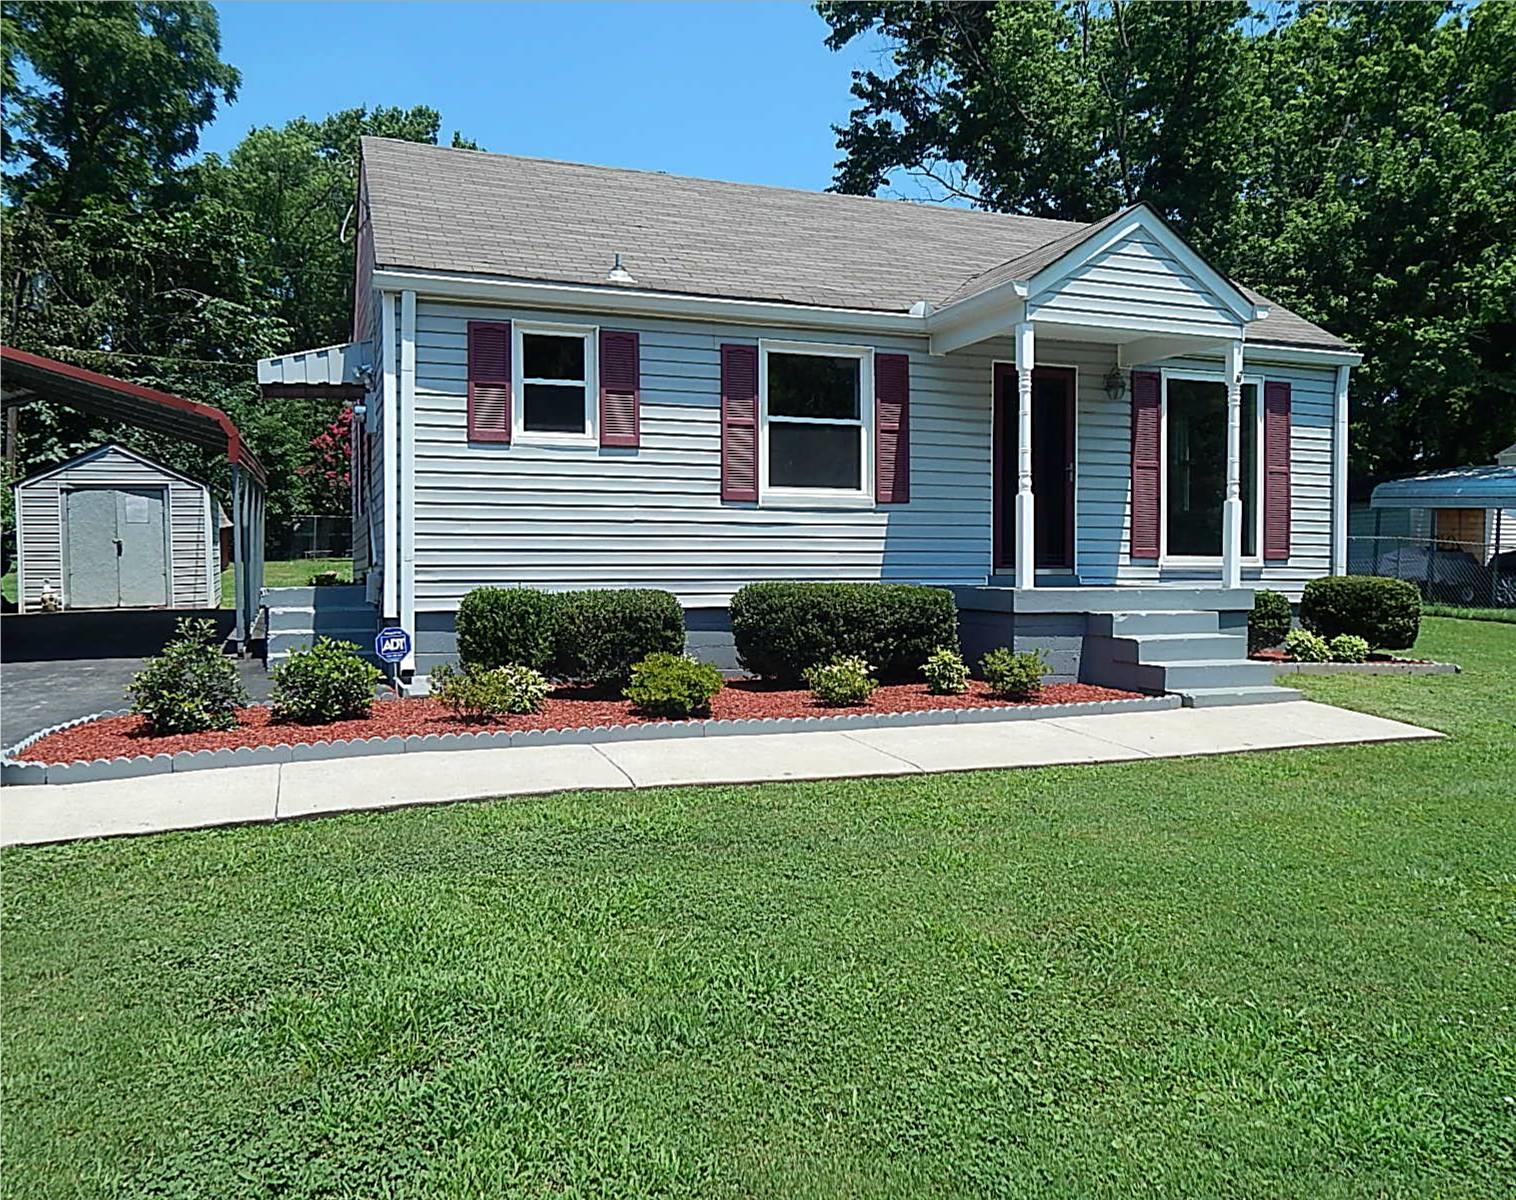 1202 Catina Dr, Nashville, TN 37217 - Nashville, TN real estate listing